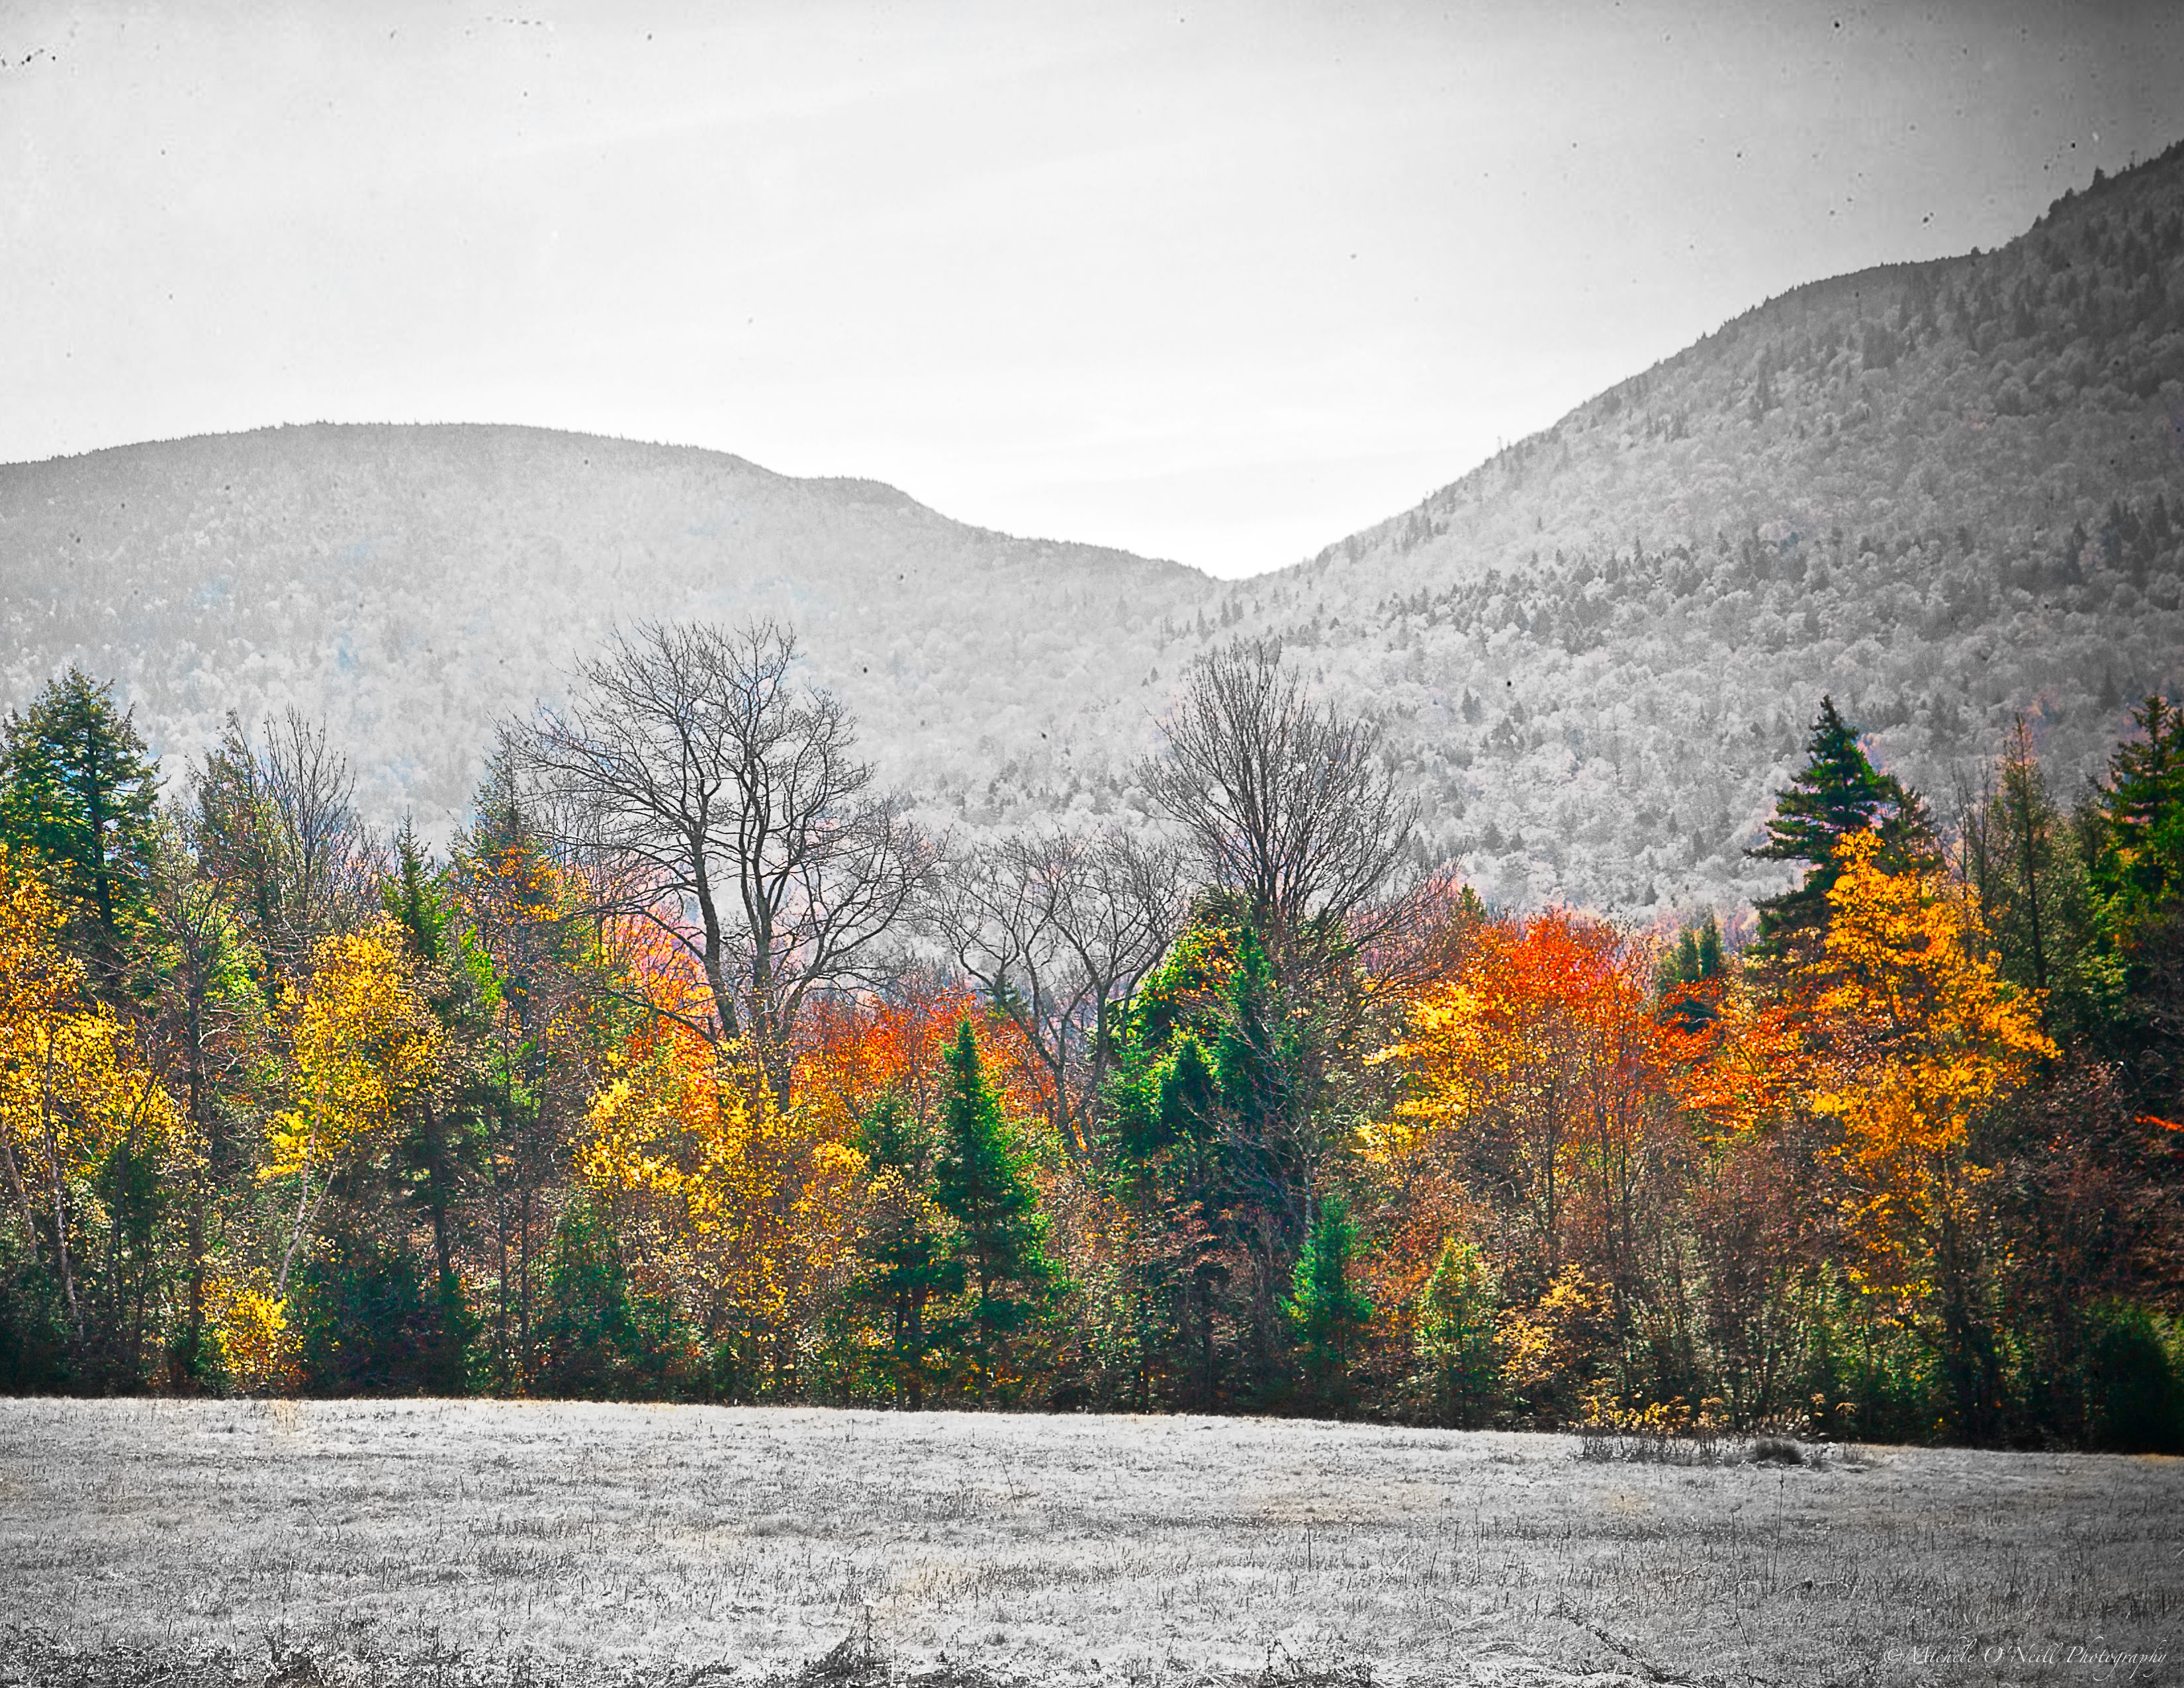 Catskill Mountains, NY Catskill mountains, Mountains, Nature